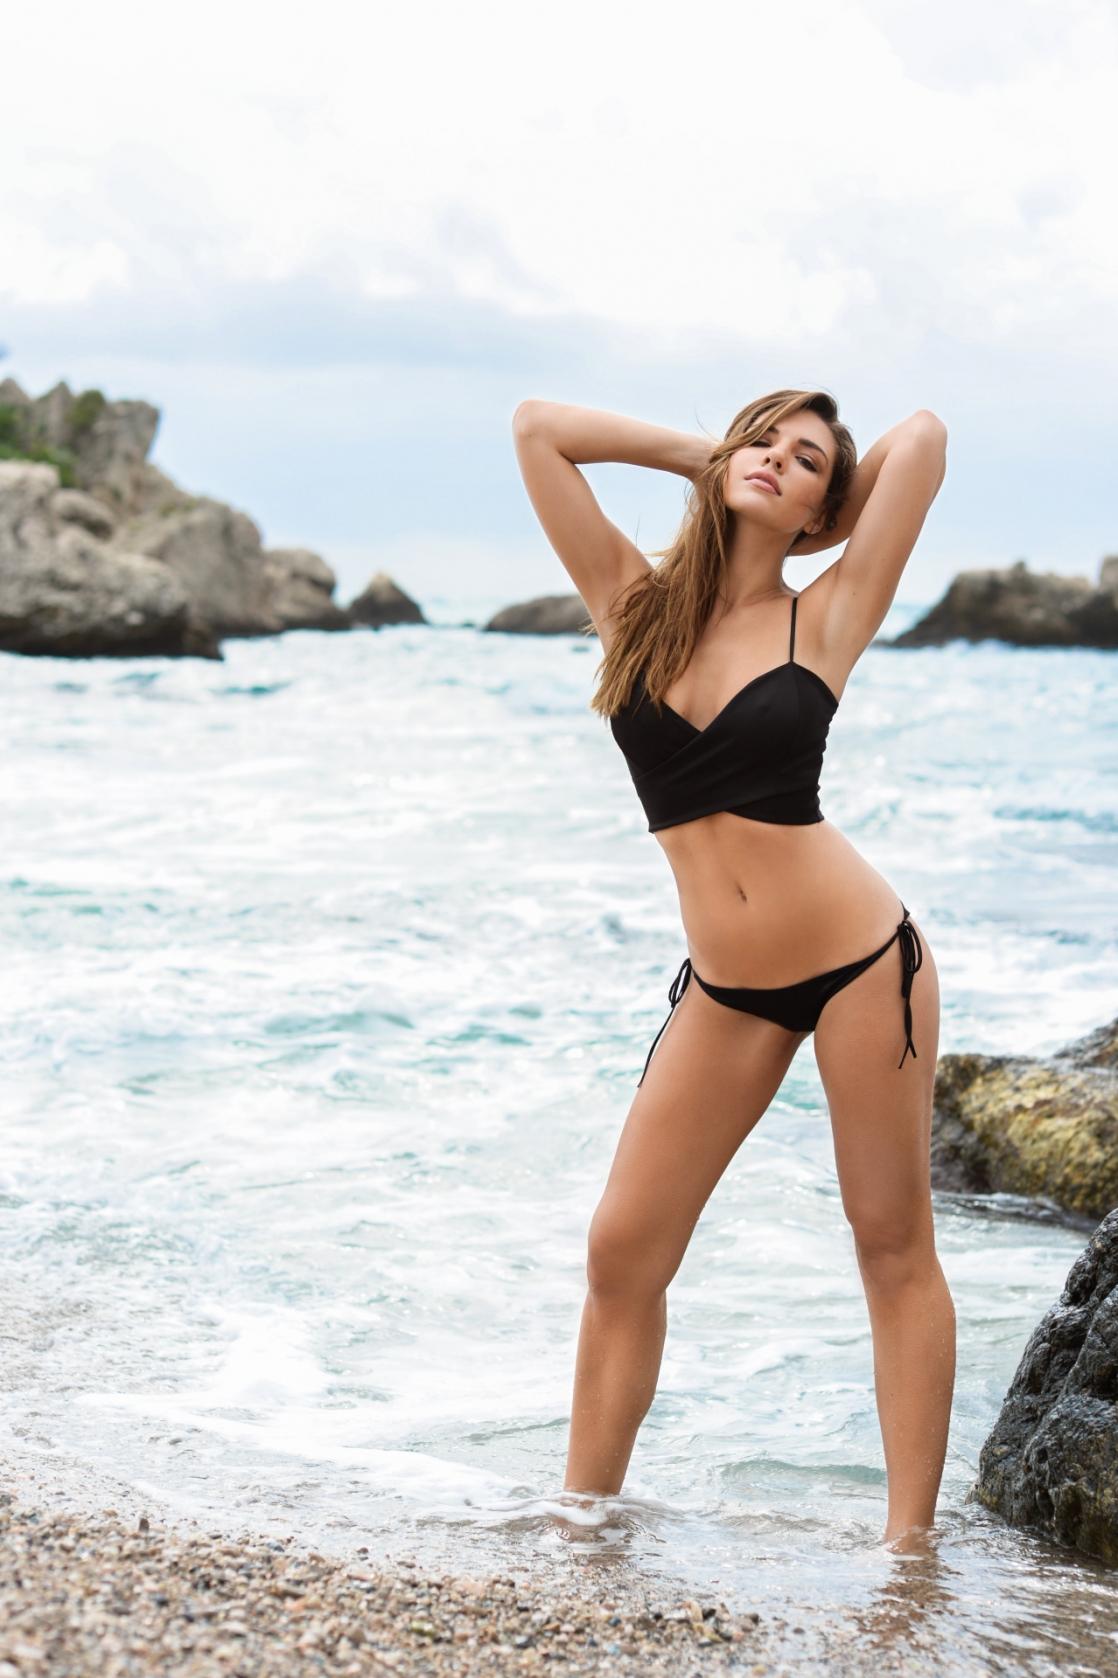 Bikini Jessica Ashley naked (93 photos), Tits, Cleavage, Instagram, butt 2006